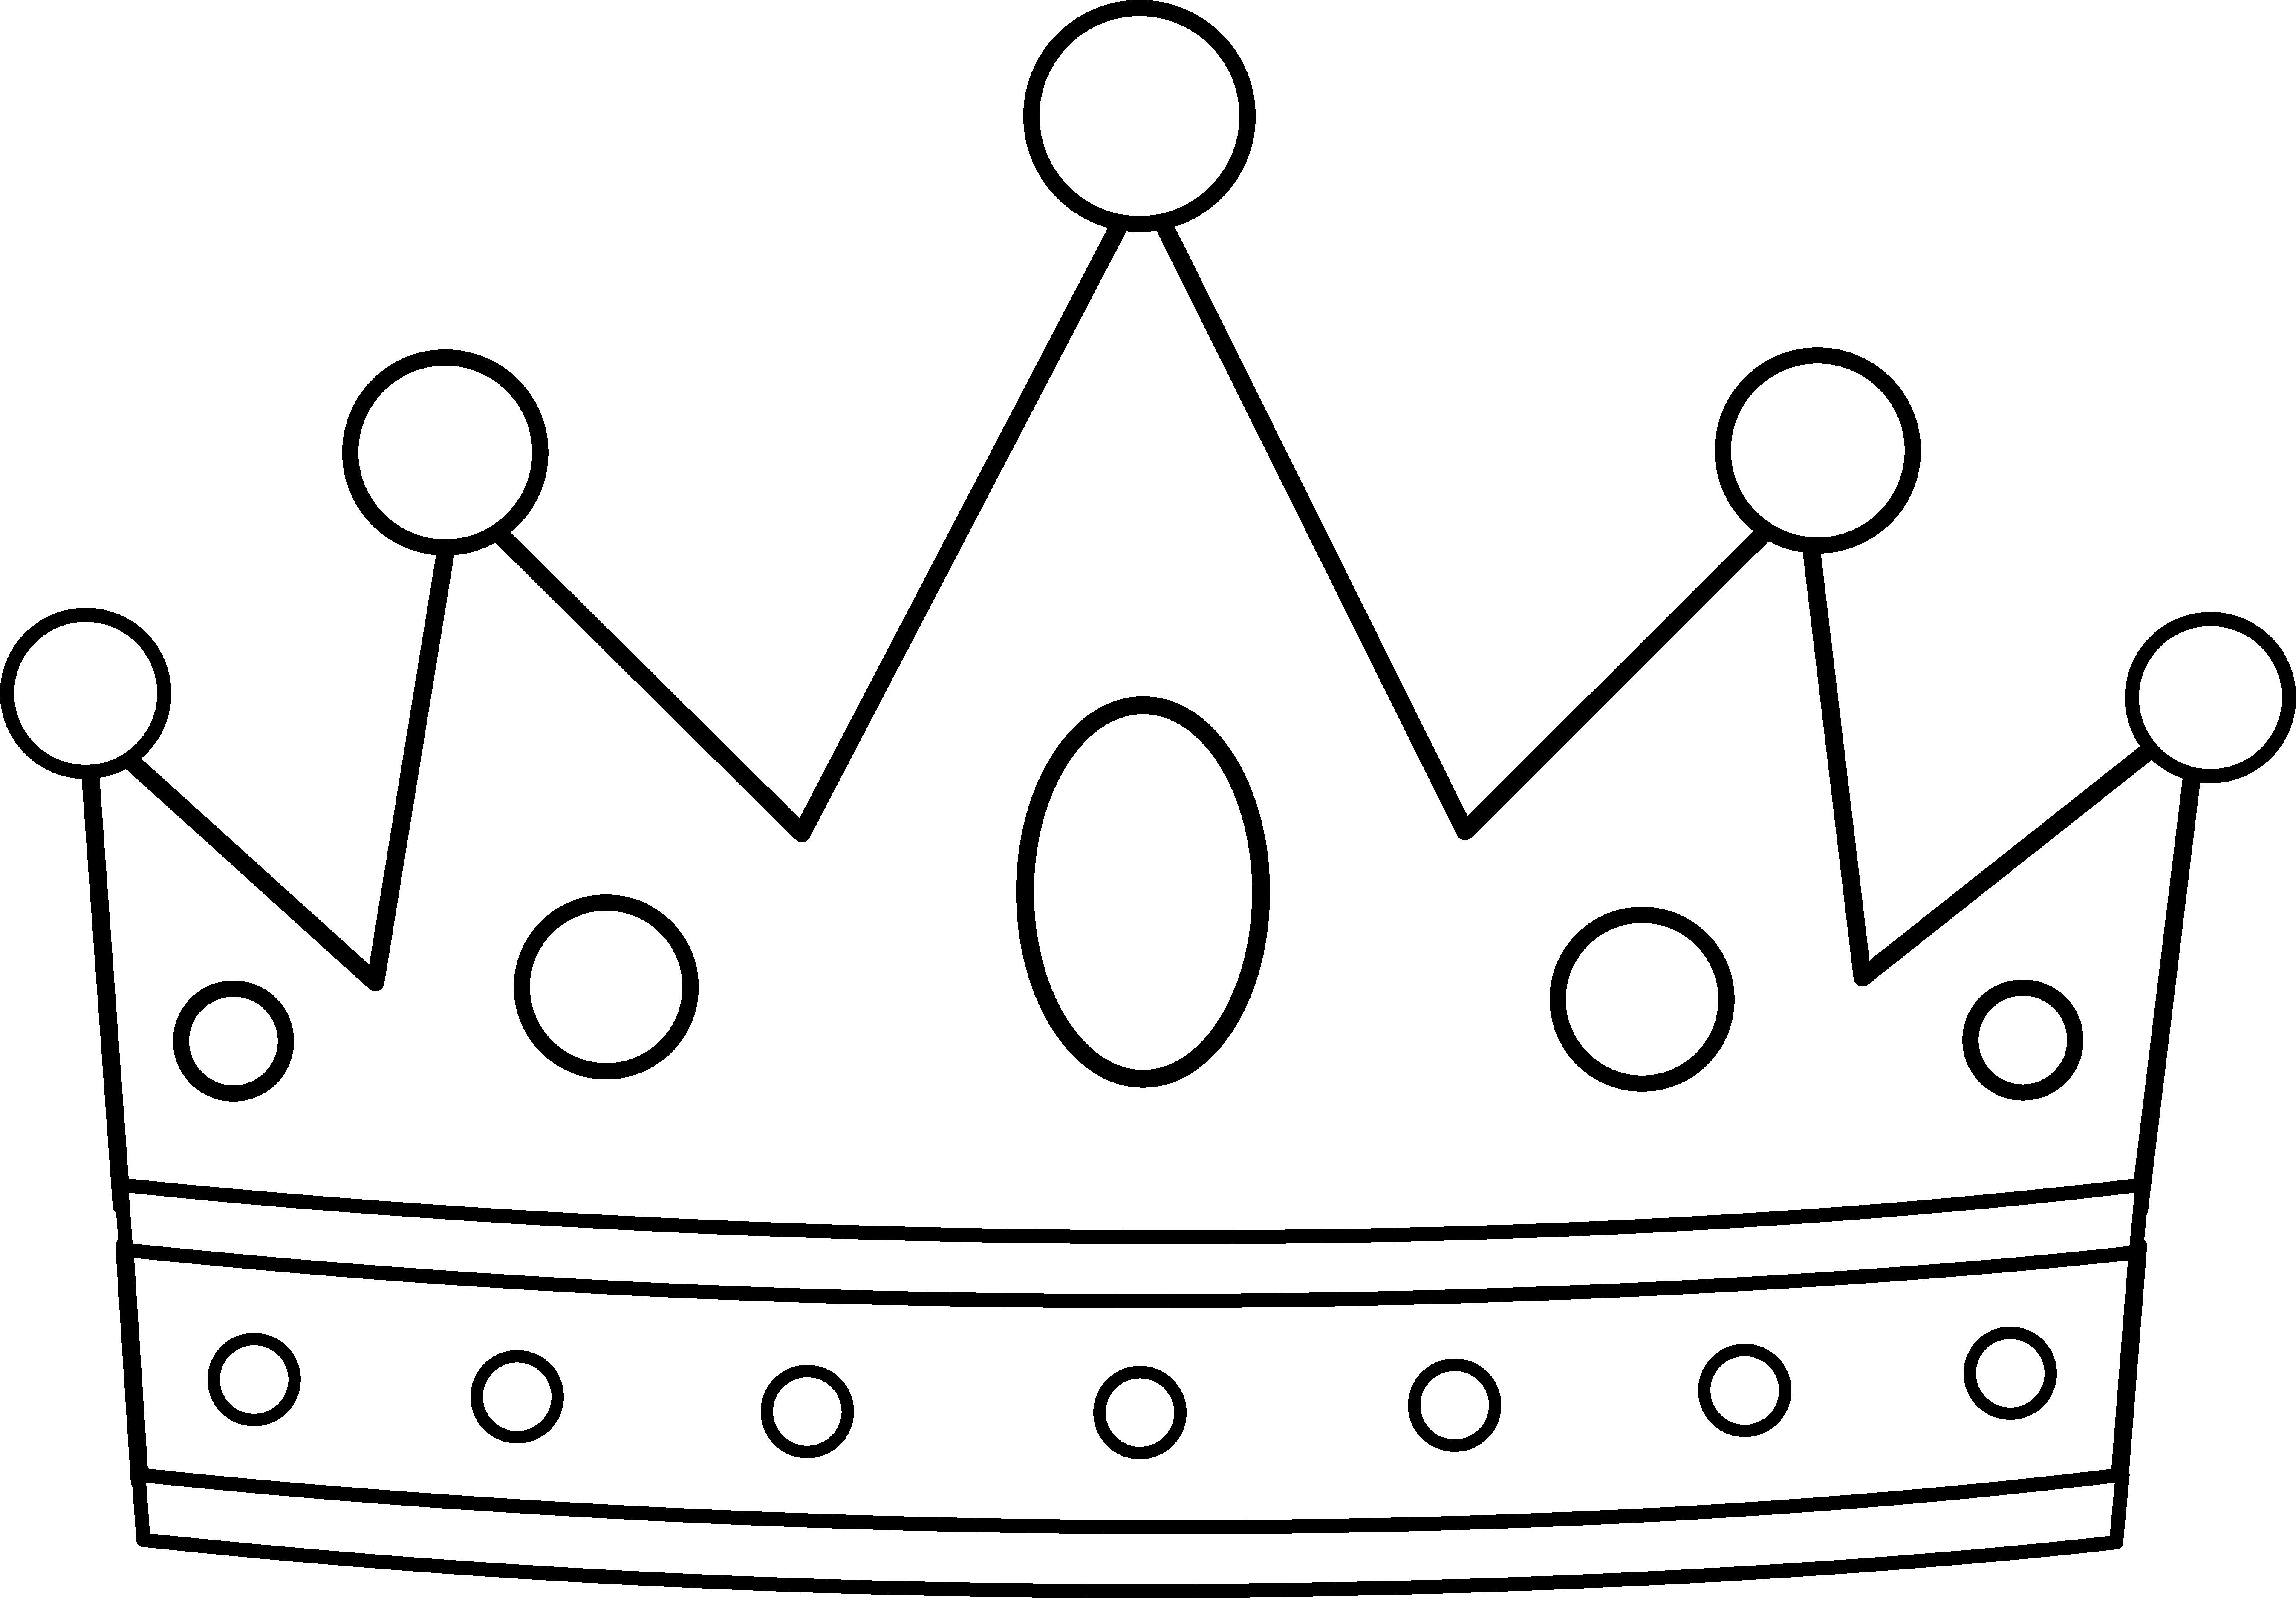 King crown clip.